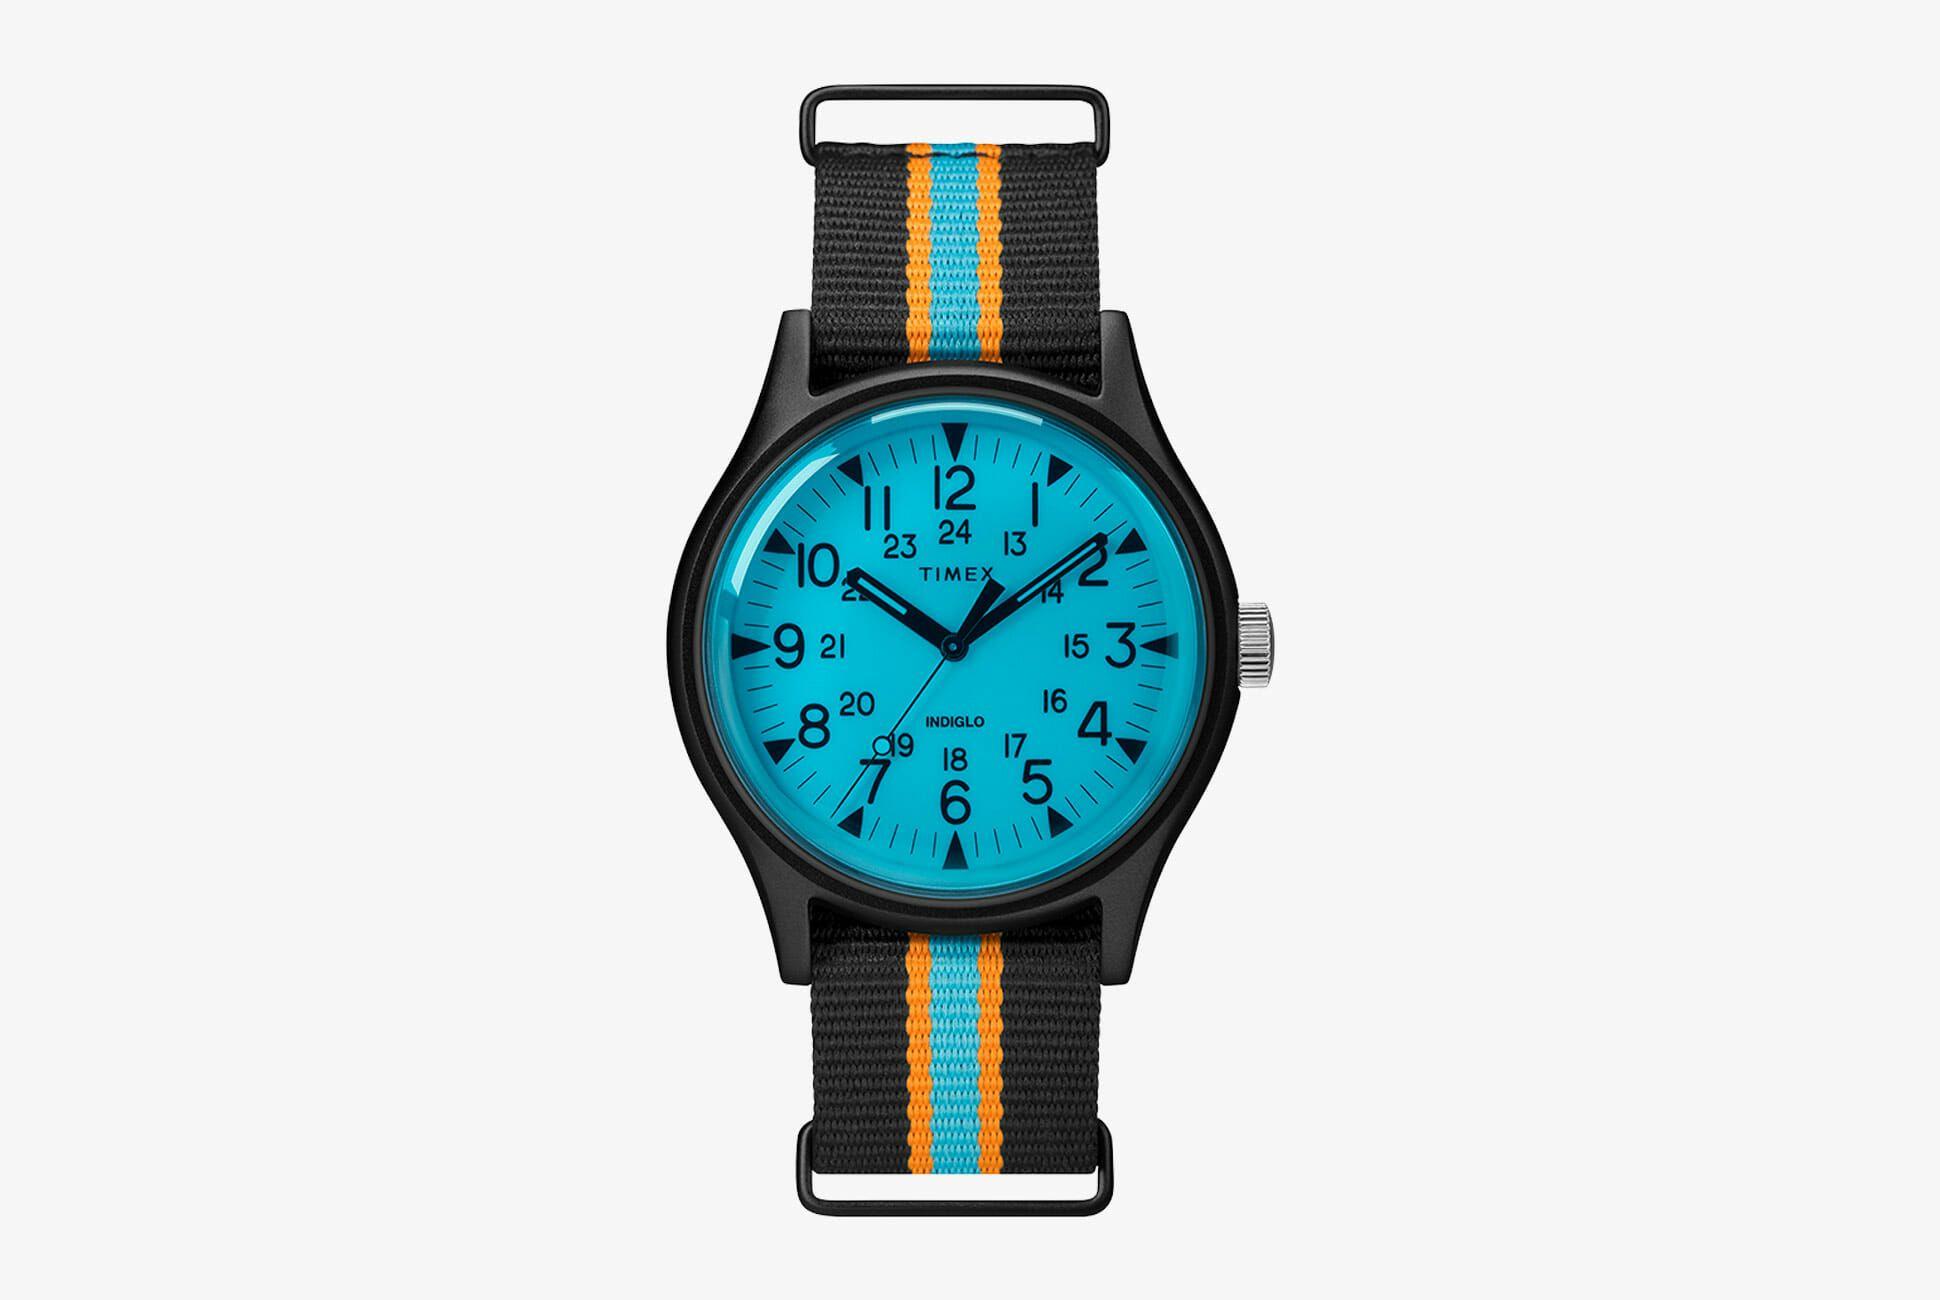 Timex-California-Deal-Gear-Patrol-Slide-1